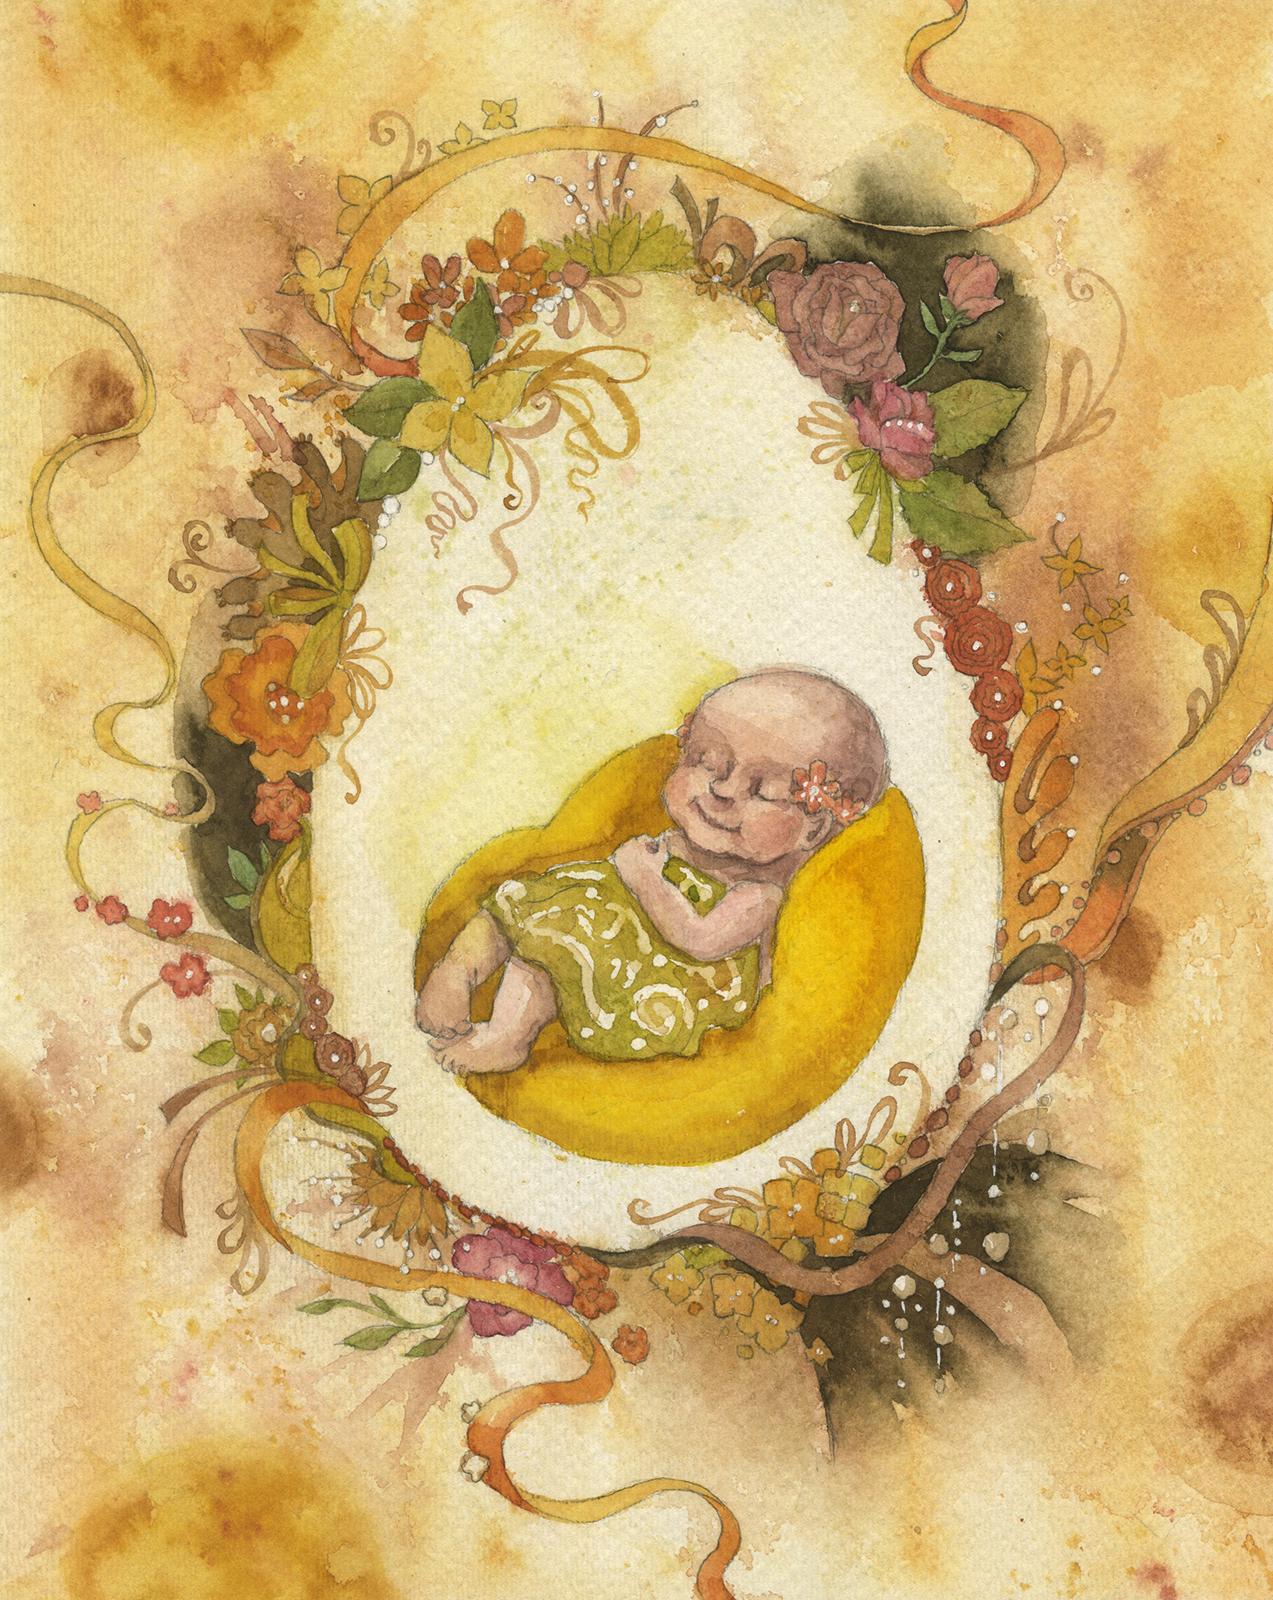 Illustration by Jungjoo Yang